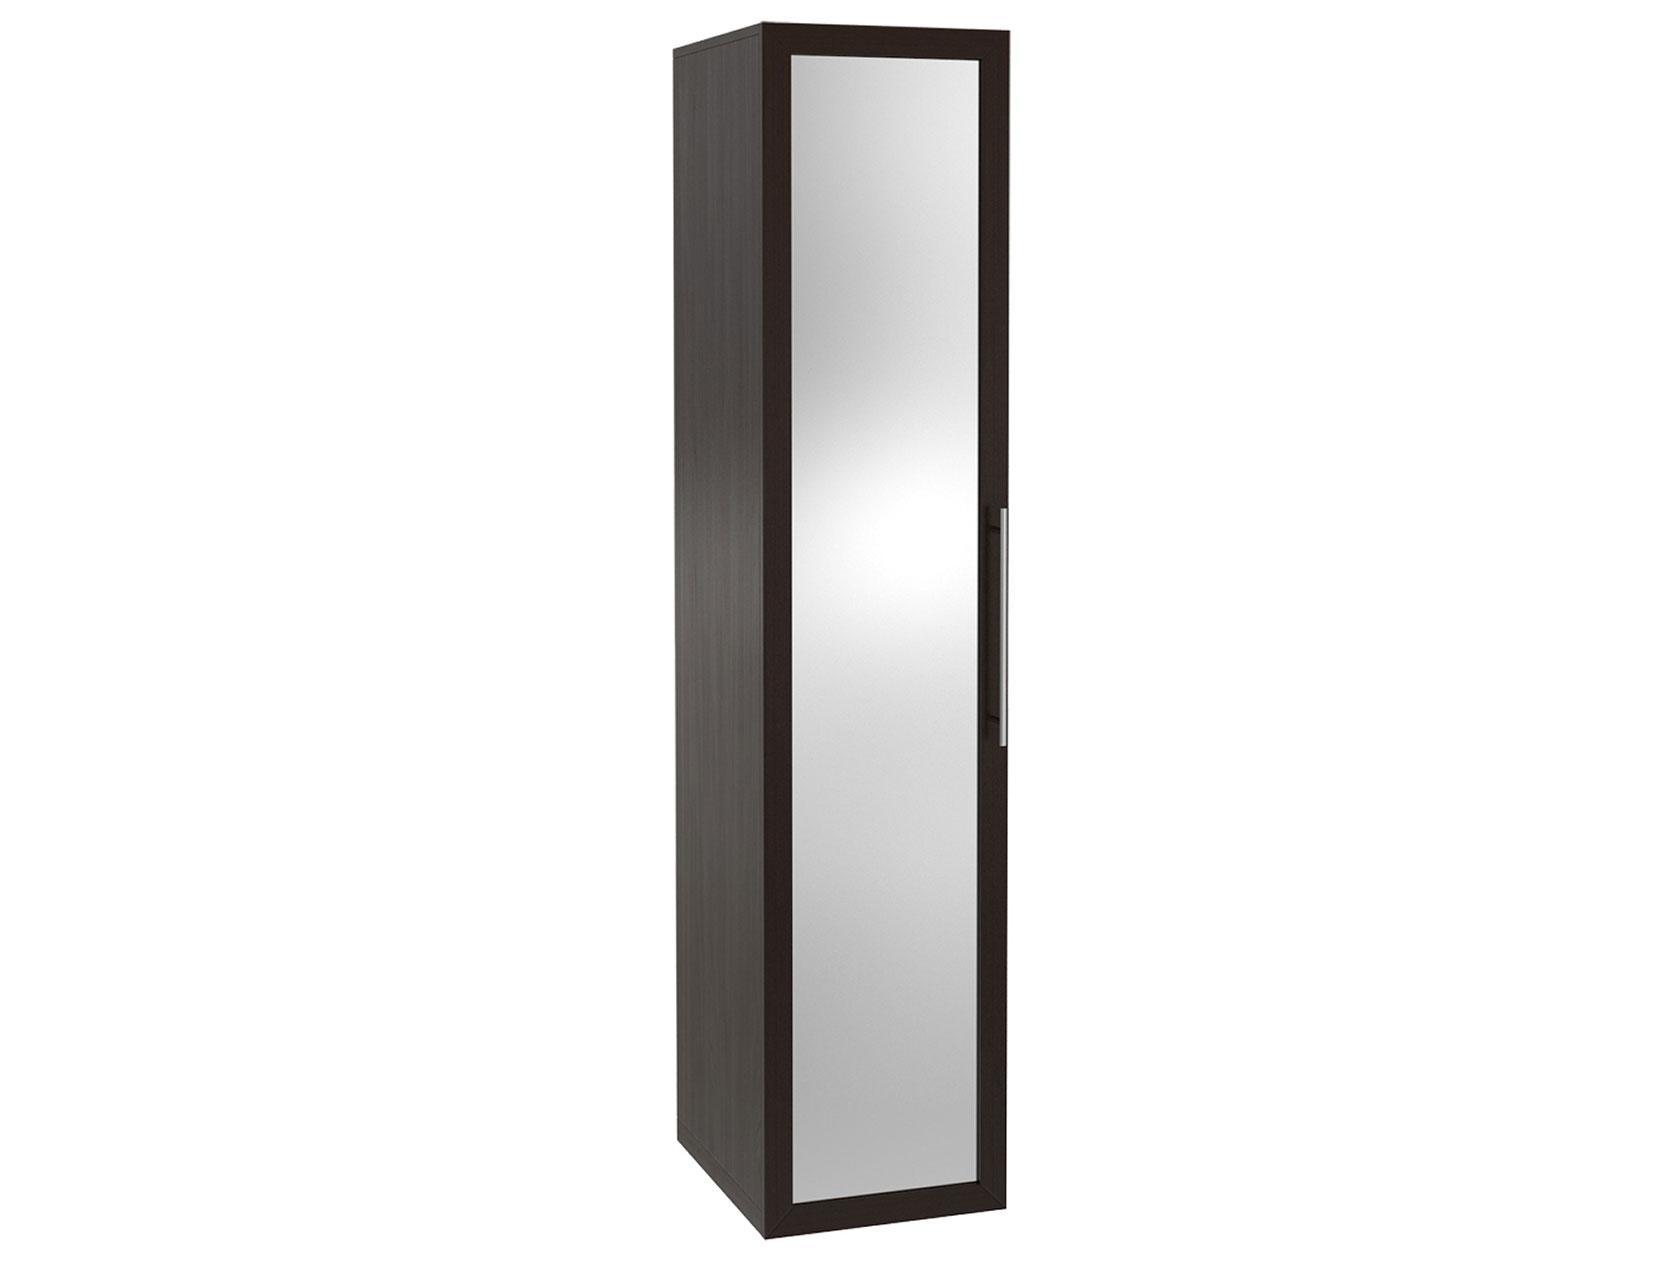 Шкаф-пенал с зеркалом 150-73497